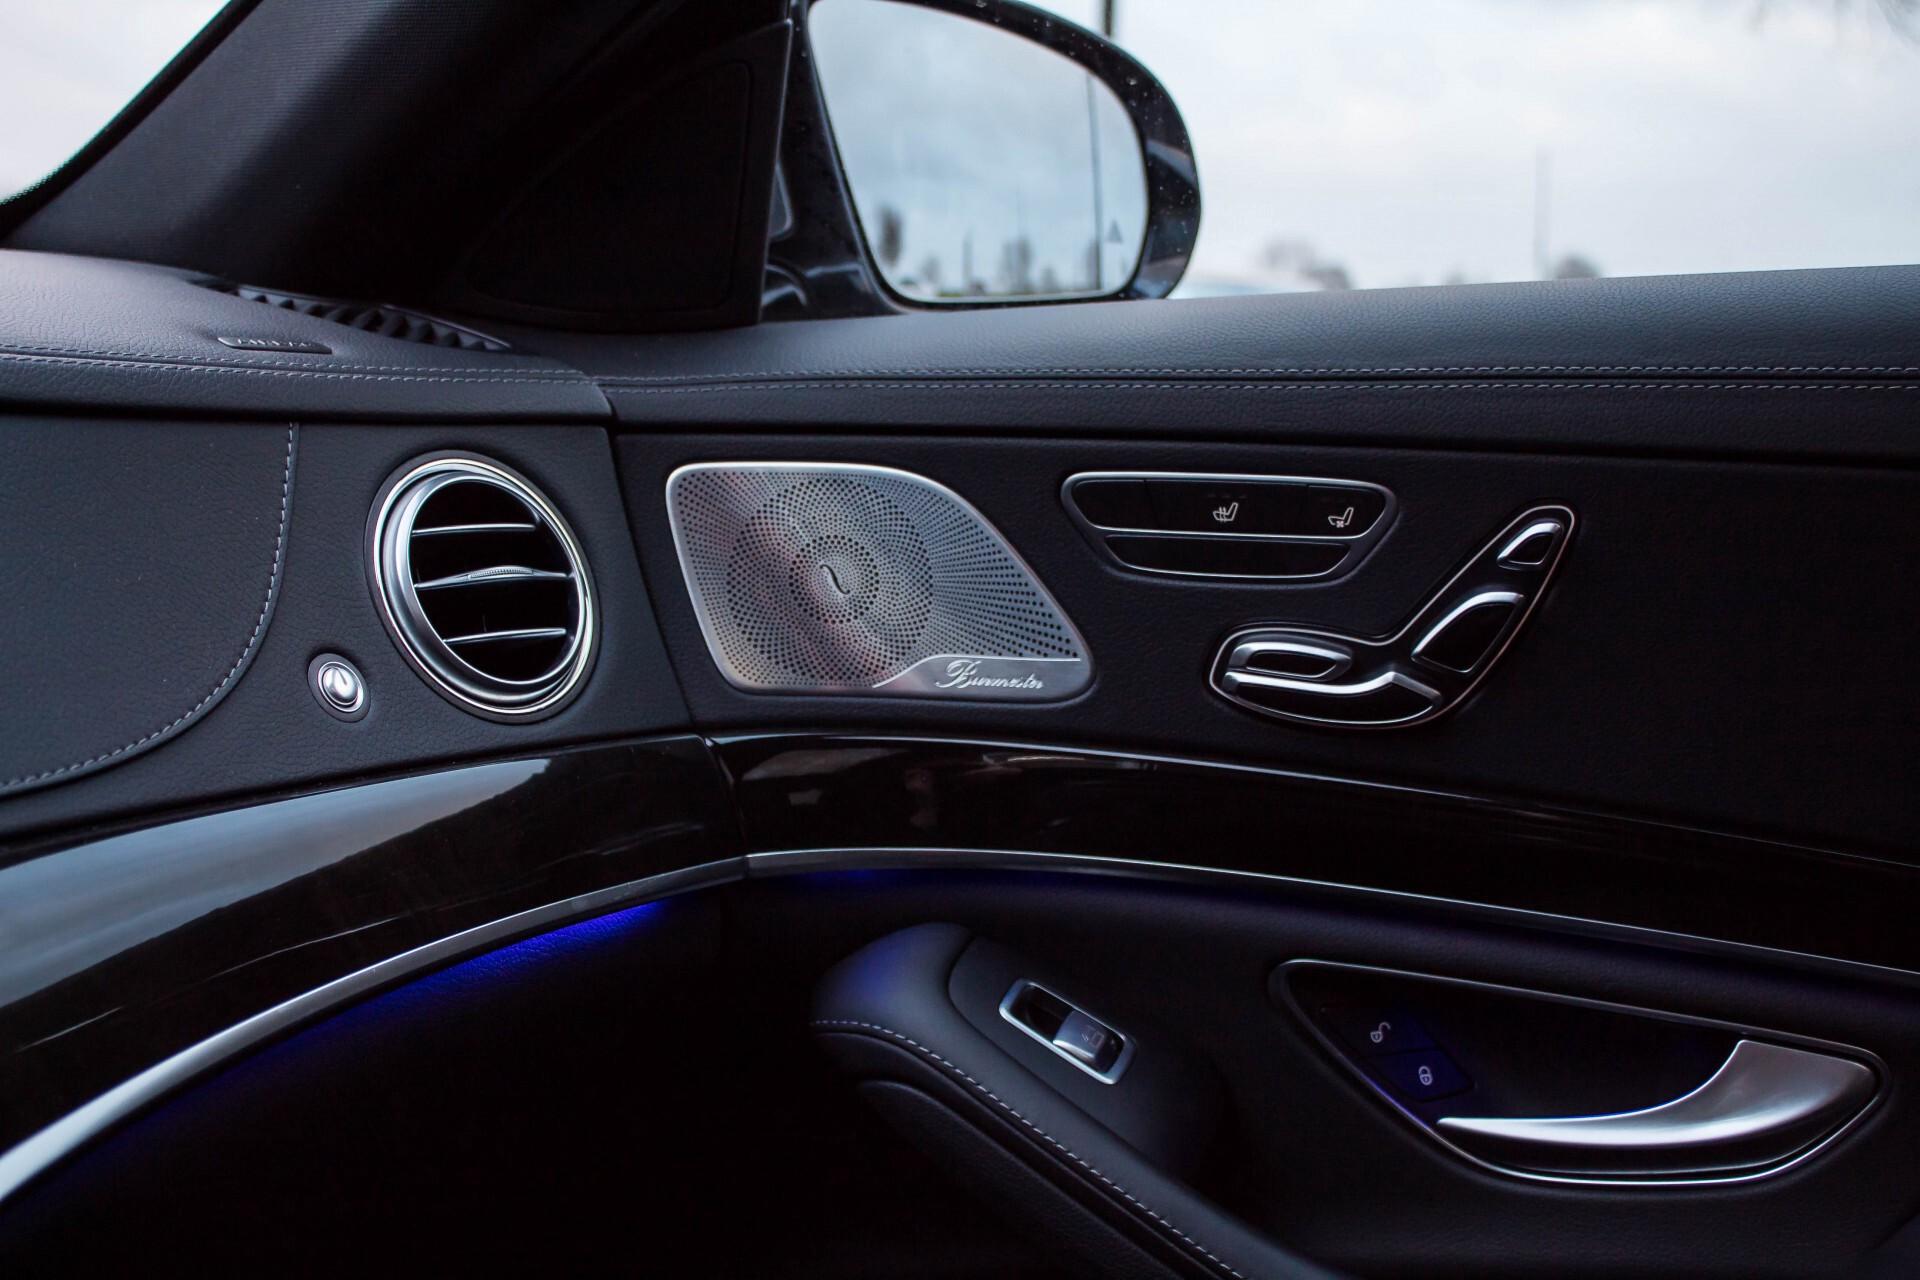 Mercedes-Benz S-Klasse 350 BlueTEC 63 AMG Panorama/Distronic/Keyless/Massage/Burmester Aut7 Foto 13